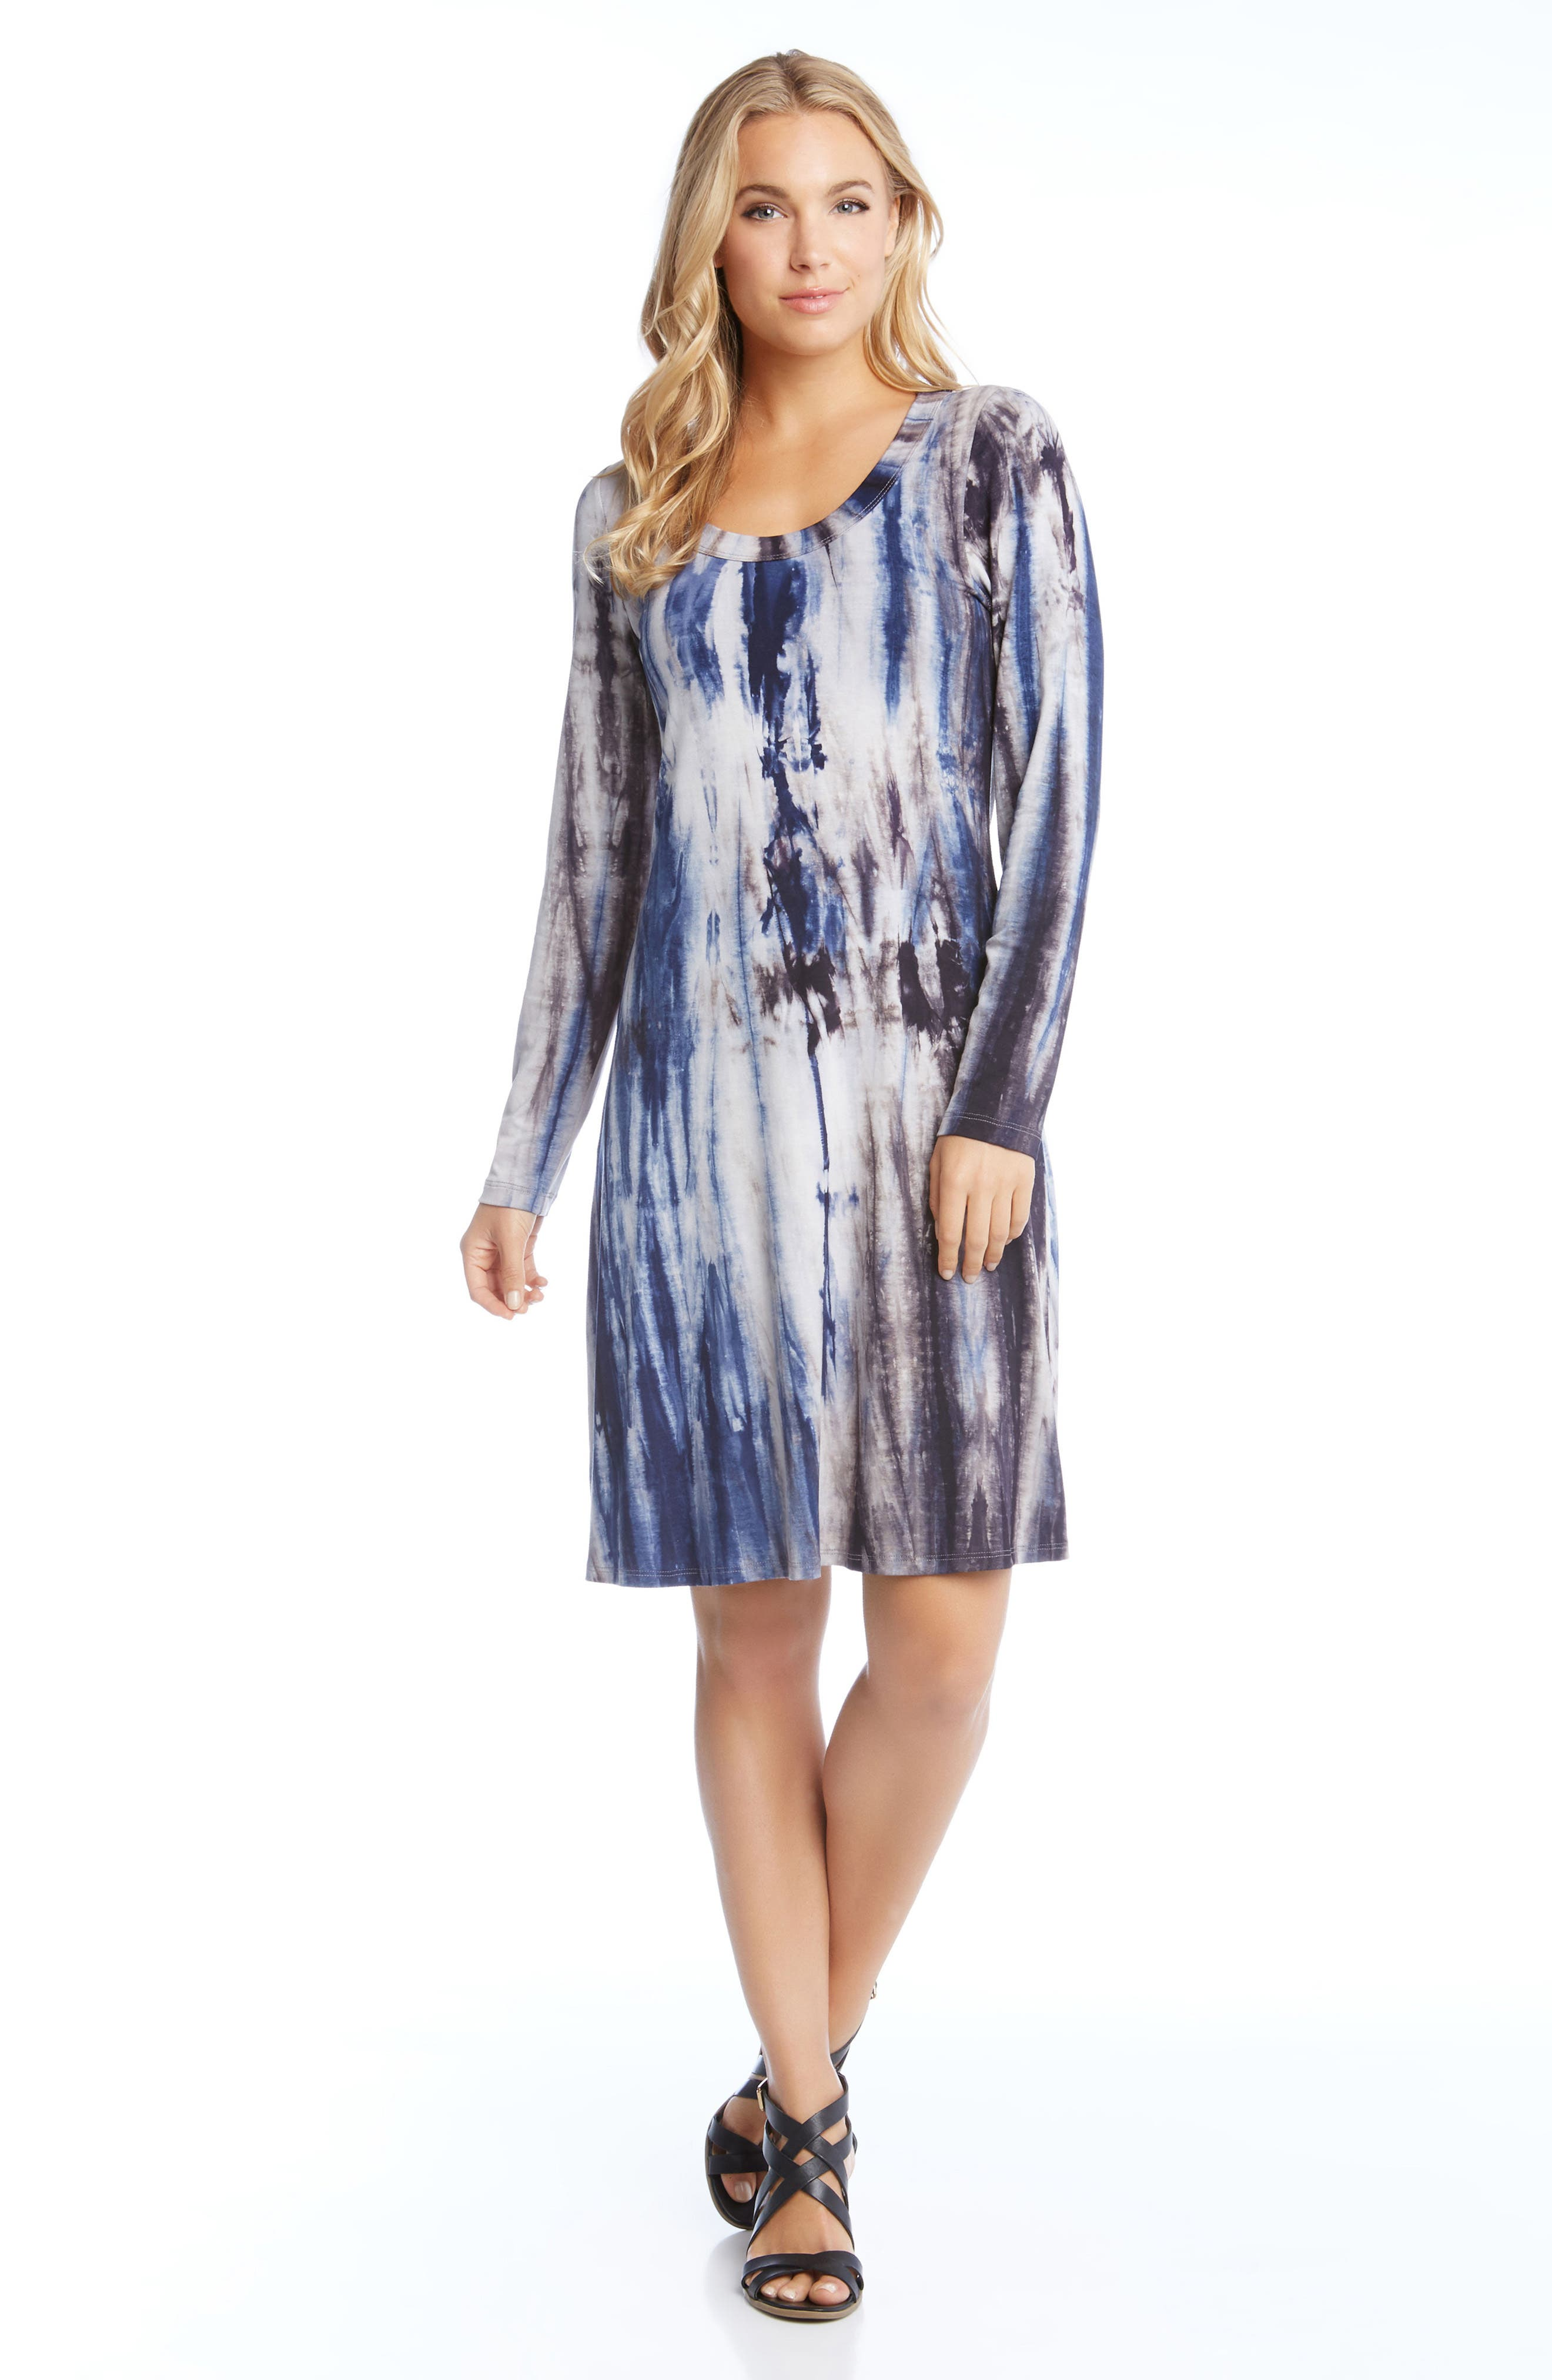 Scooped Neck A-Line Dress,                             Alternate thumbnail 2, color,                             Tie-Dye